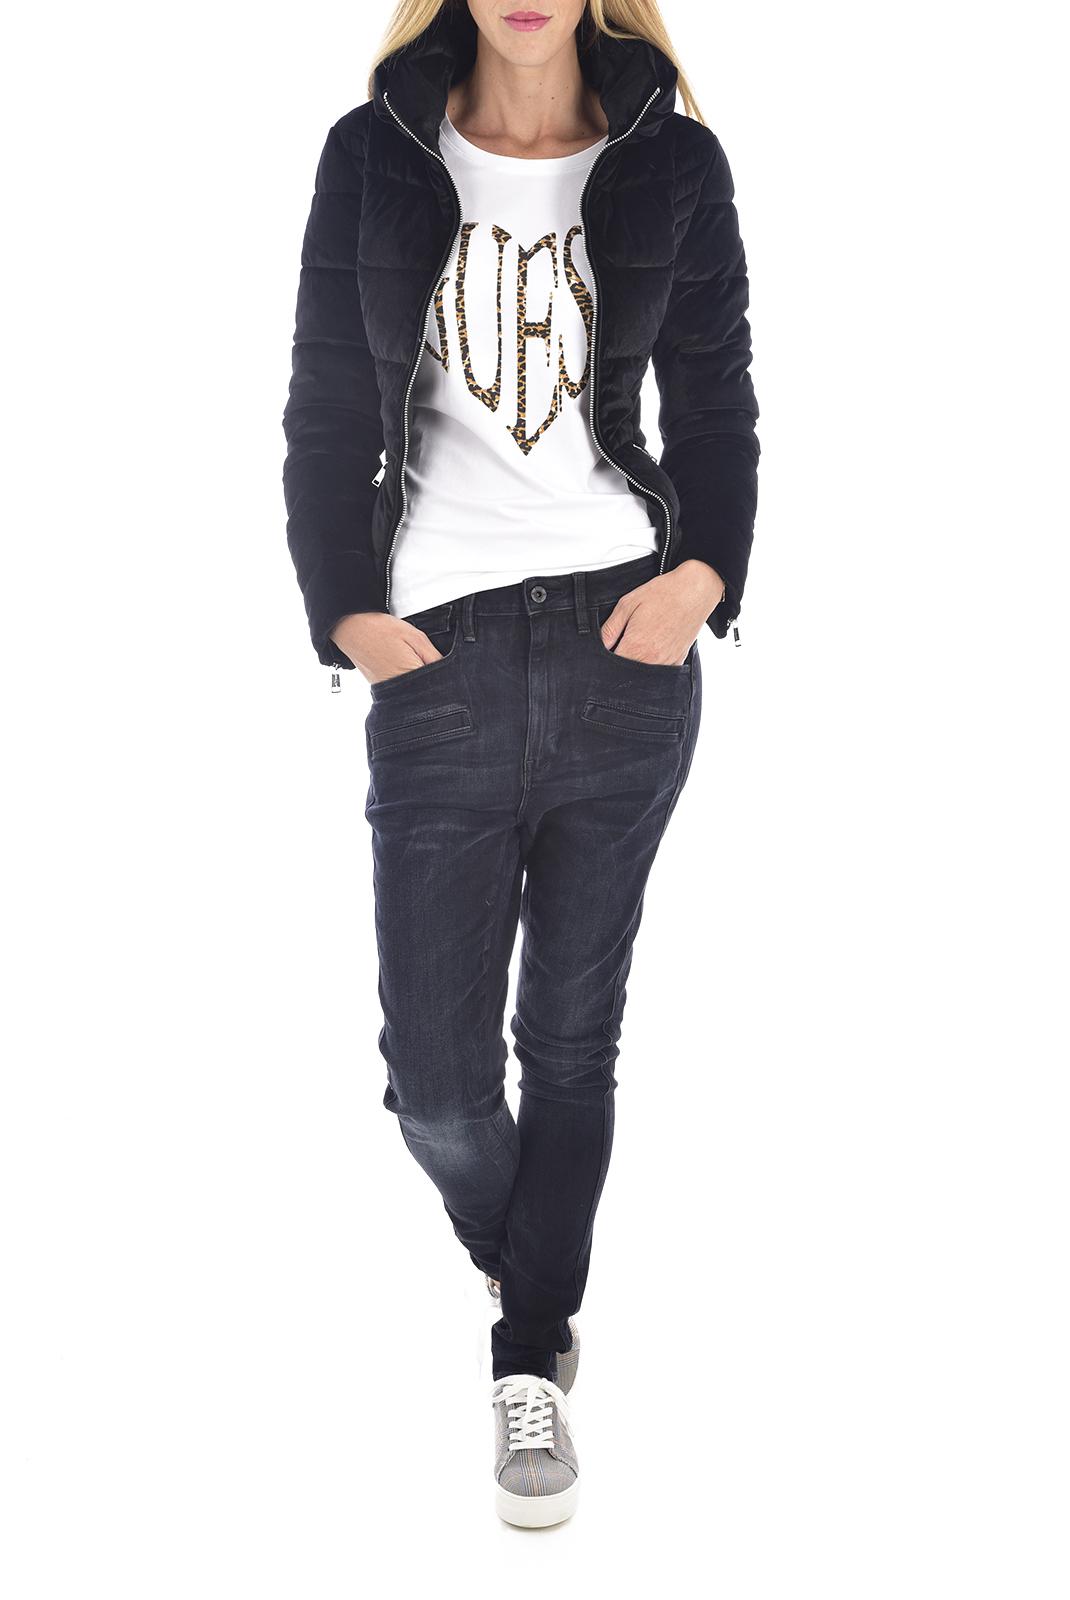 Blouson / doudoune  Guess jeans W94L0I WC570 Jet Black A996